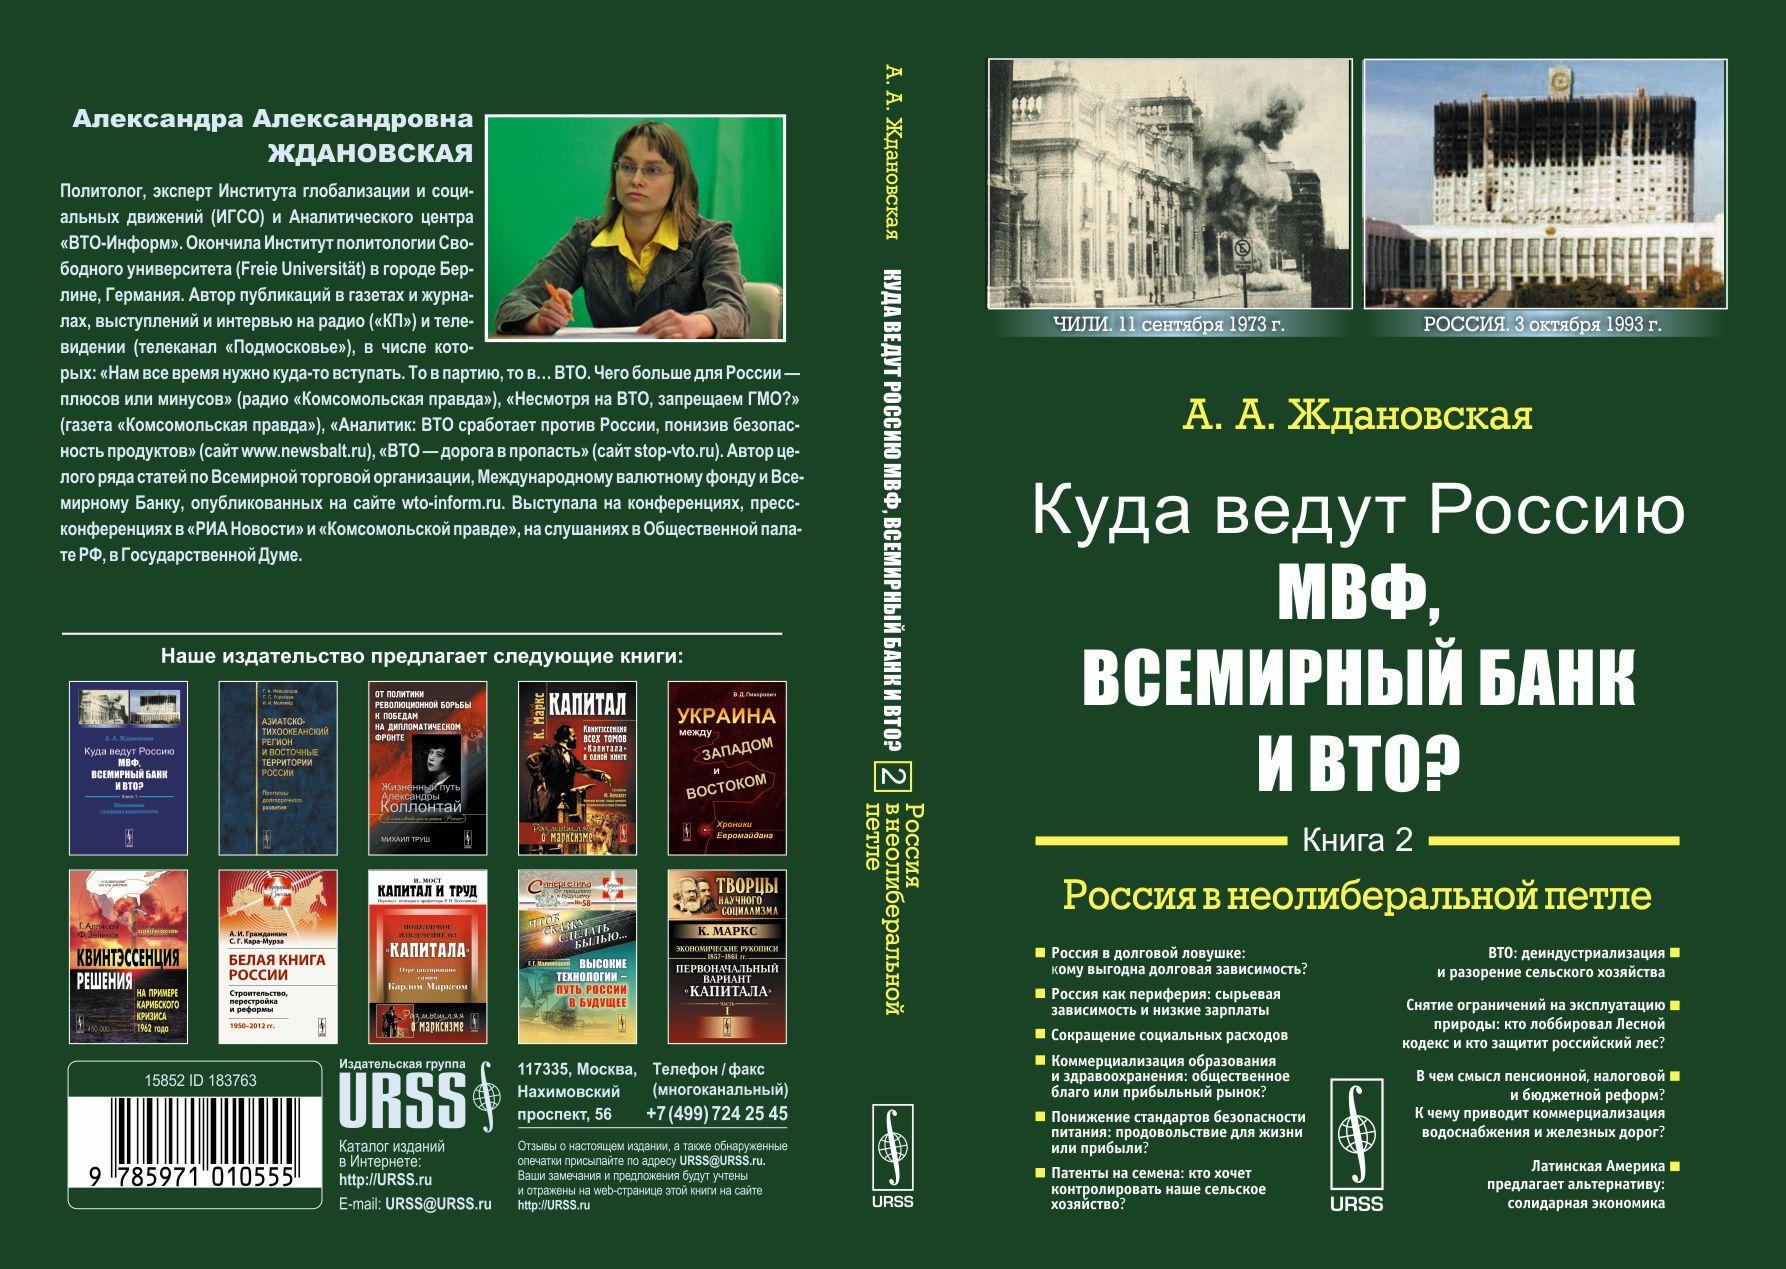 ZhdanovskaiaAA.15852-cover